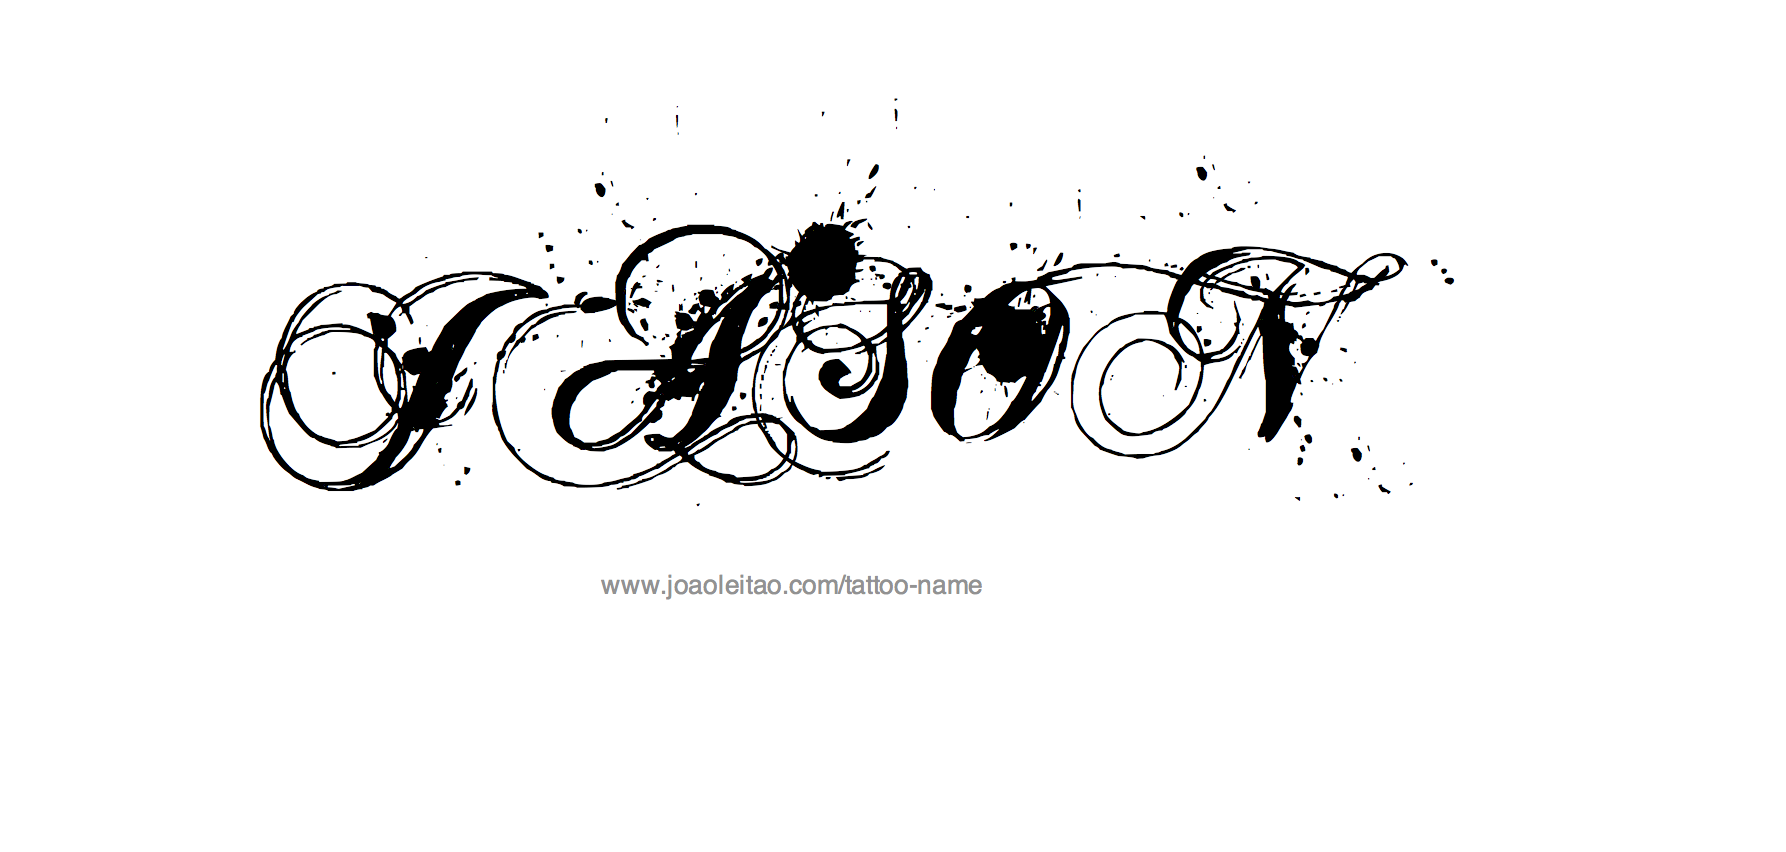 Jason Name Tattoo Designs Name Tattoo Designs Tattoo Designs Name Tattoo